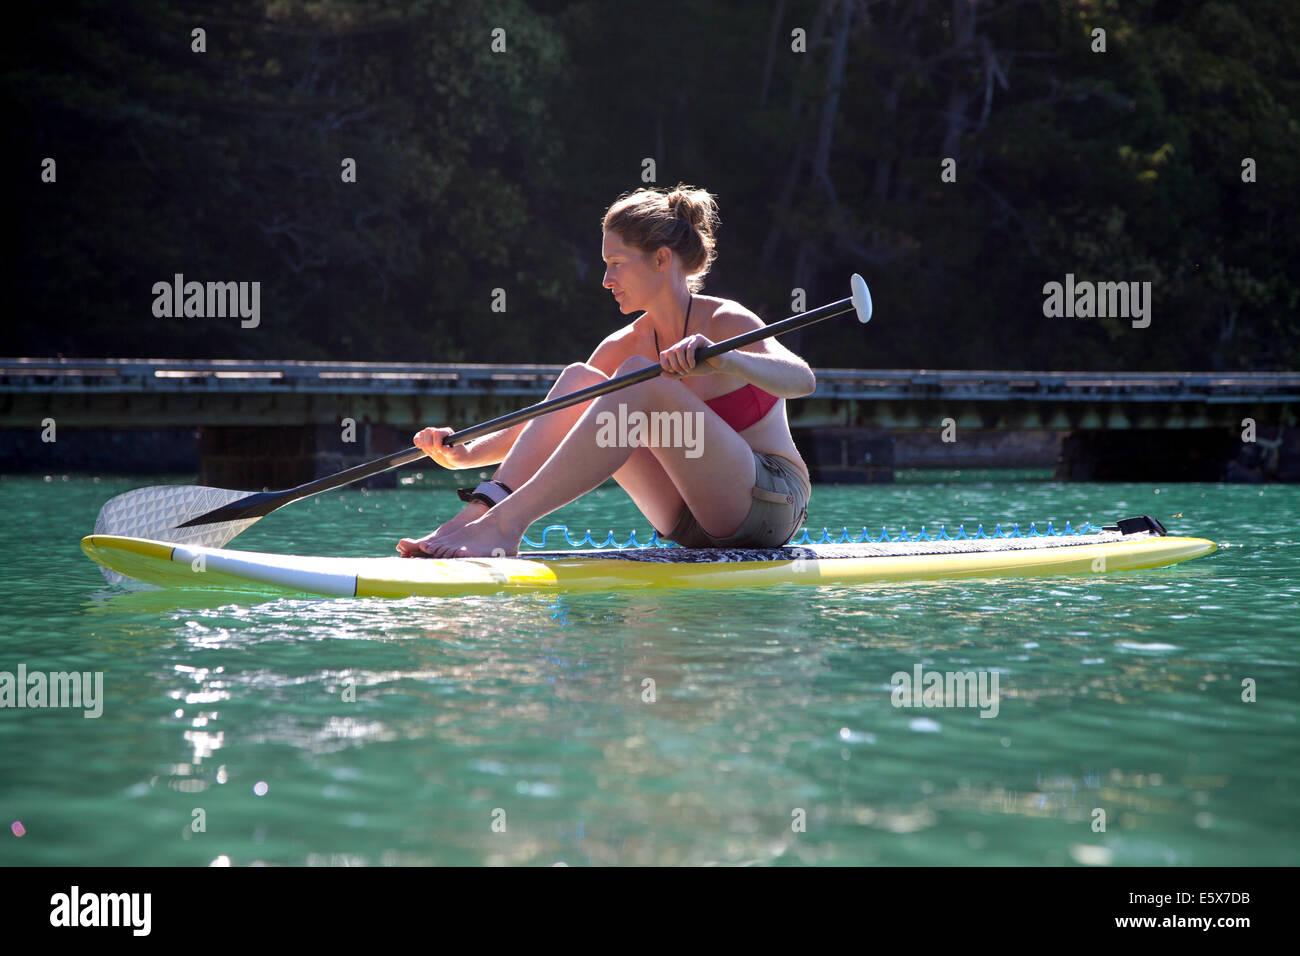 Mid adult woman asseoir paddleboarding en mer Photo Stock